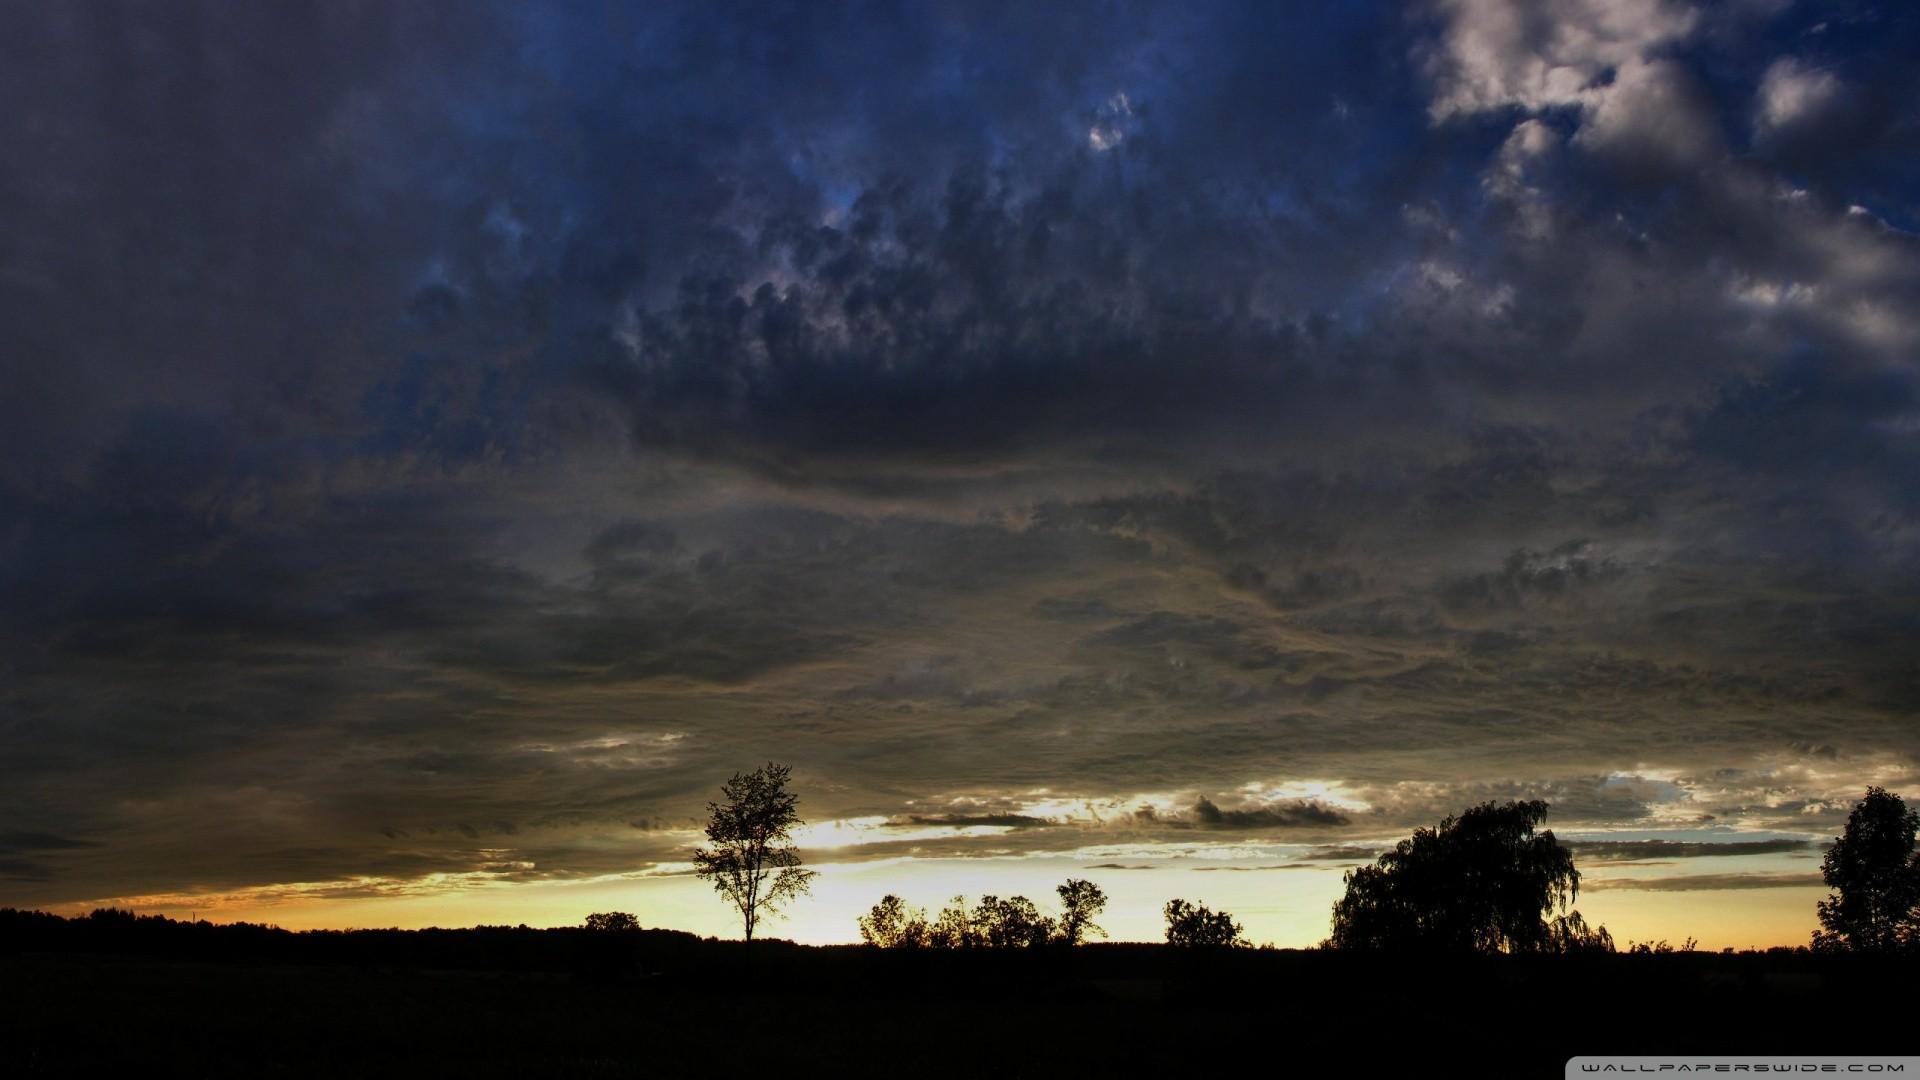 Dark Cloudy Sky Wallpaper Dark, Cloudy, Sky